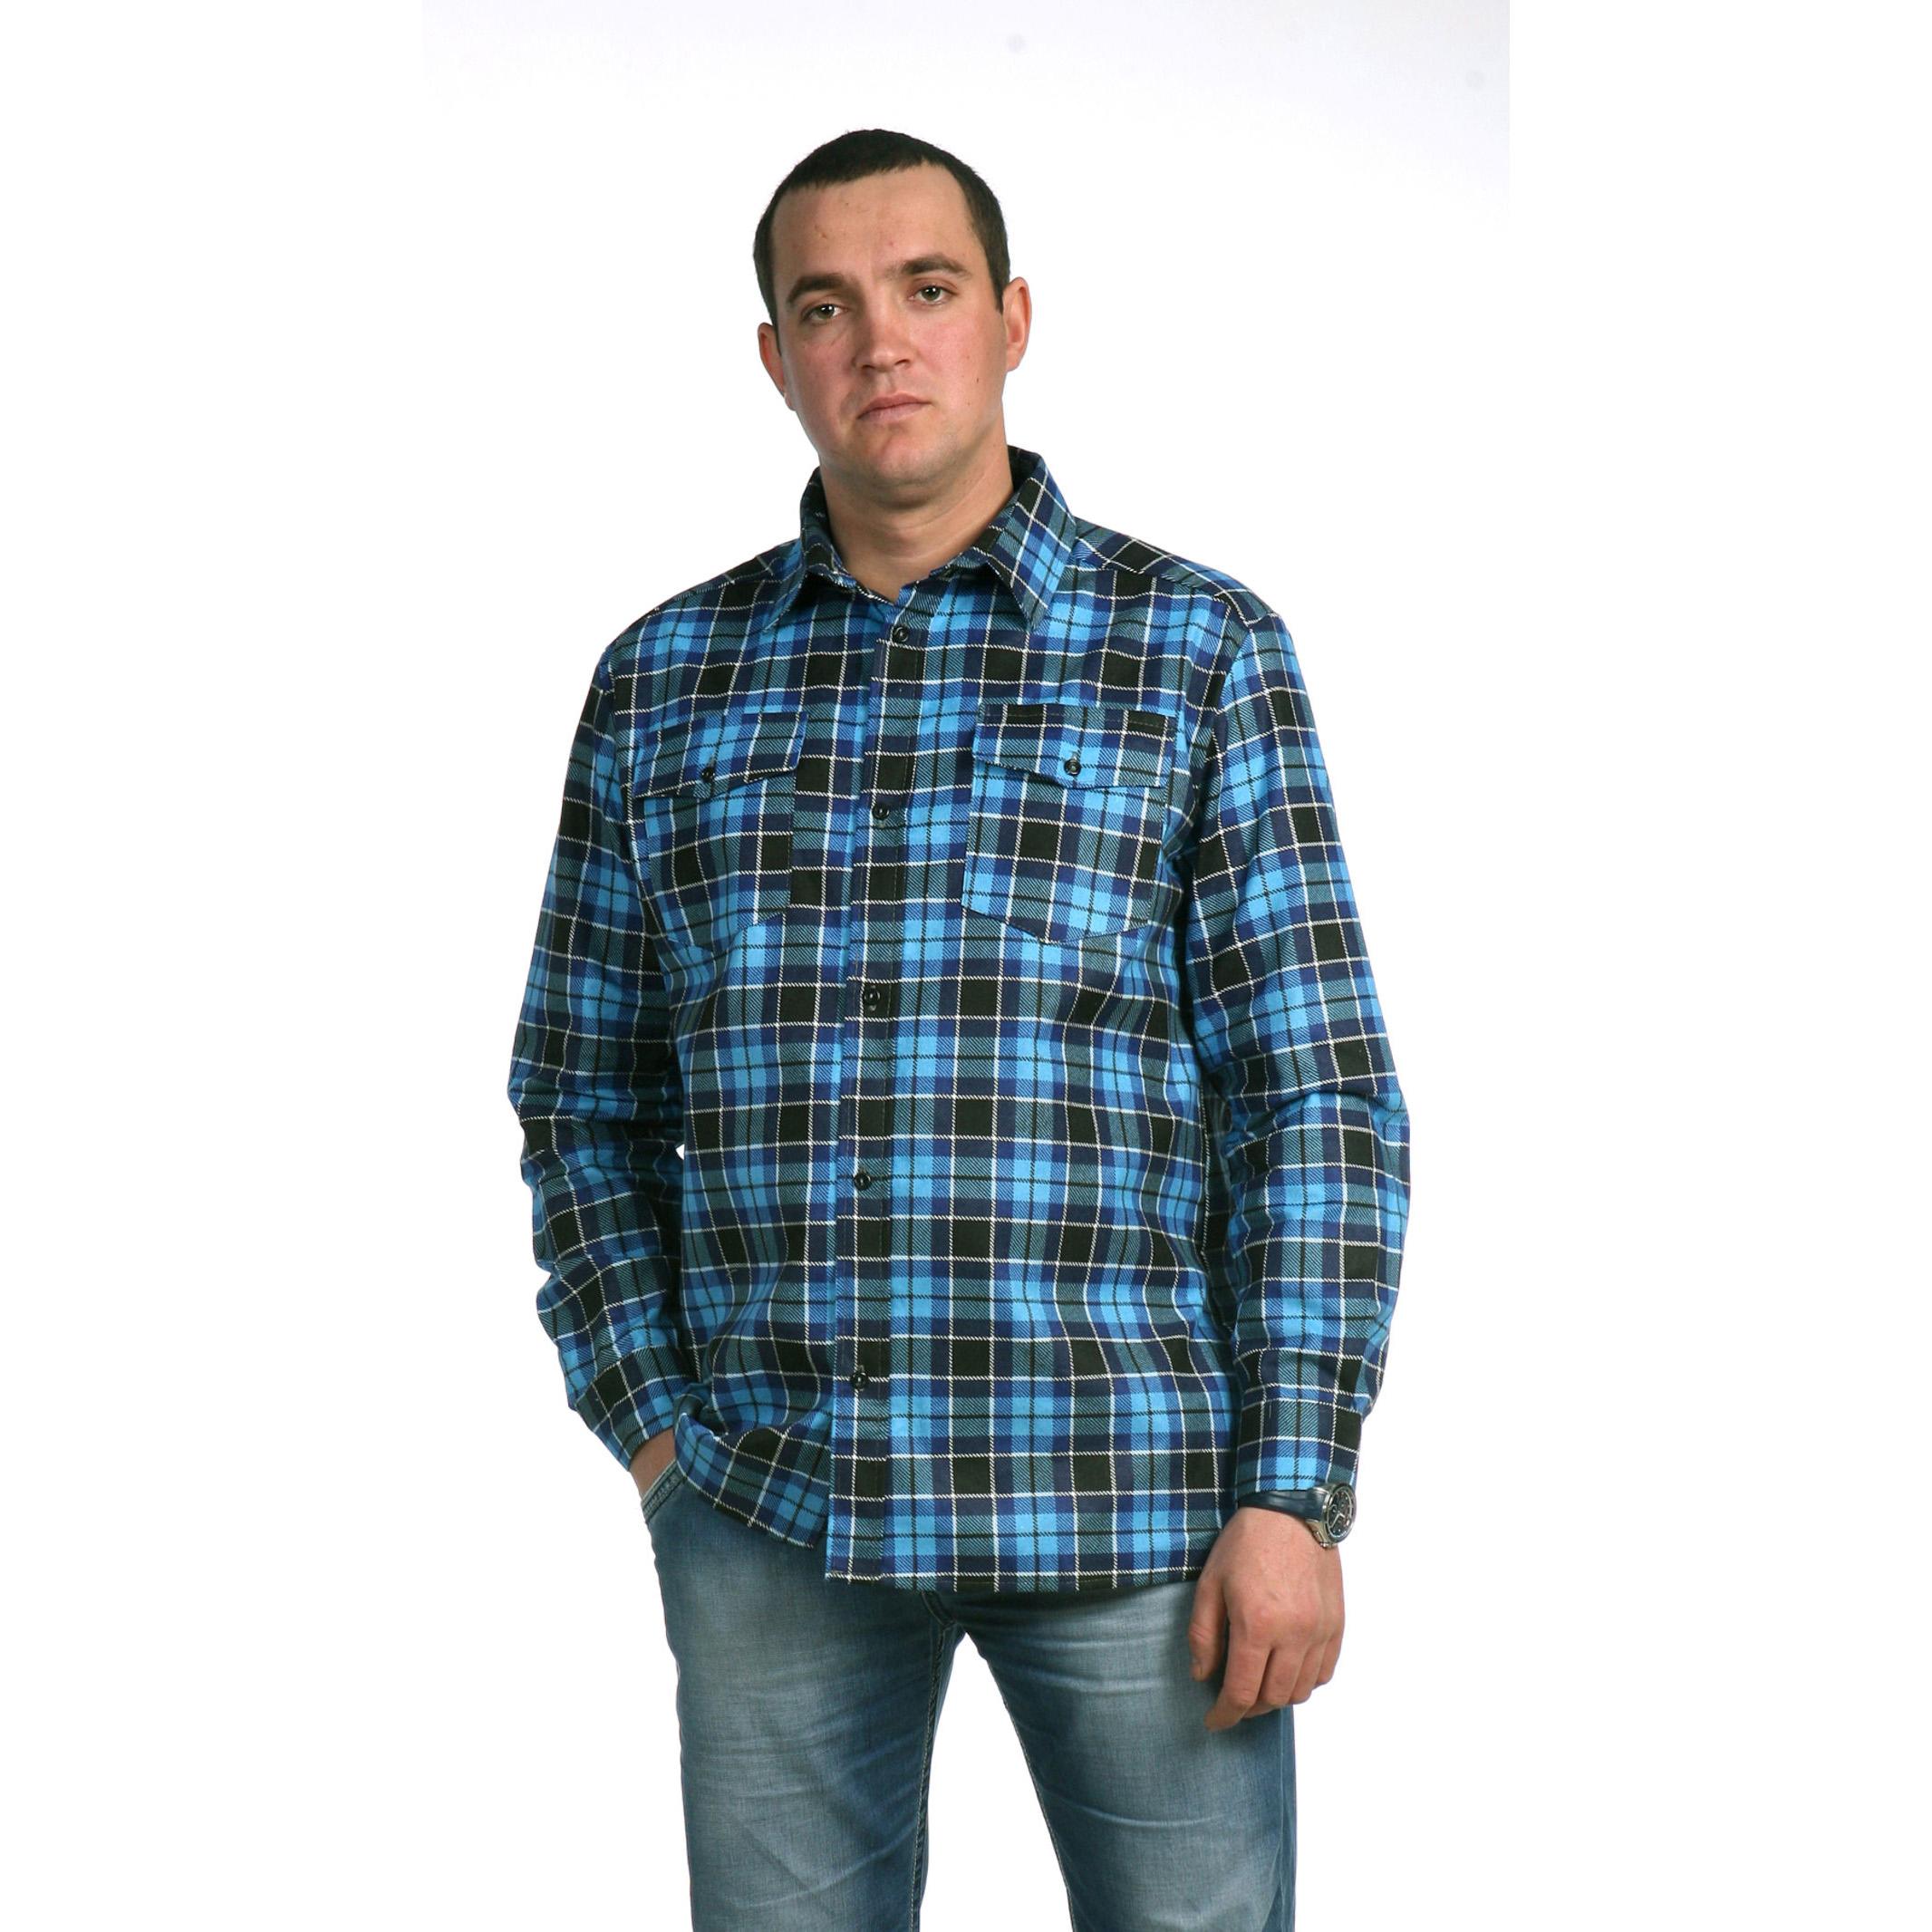 Мужская рубашка «Гарри», размер 50Рубашки<br>Обхват груди:100 см<br>Обхват талии:92 см<br>Обхват бедер:106 см<br>Обхват шеи, ворот:41 см<br>Рост:176-182 см<br><br>Тип: Муж. рубашка<br>Размер: 50<br>Материал: Фланель